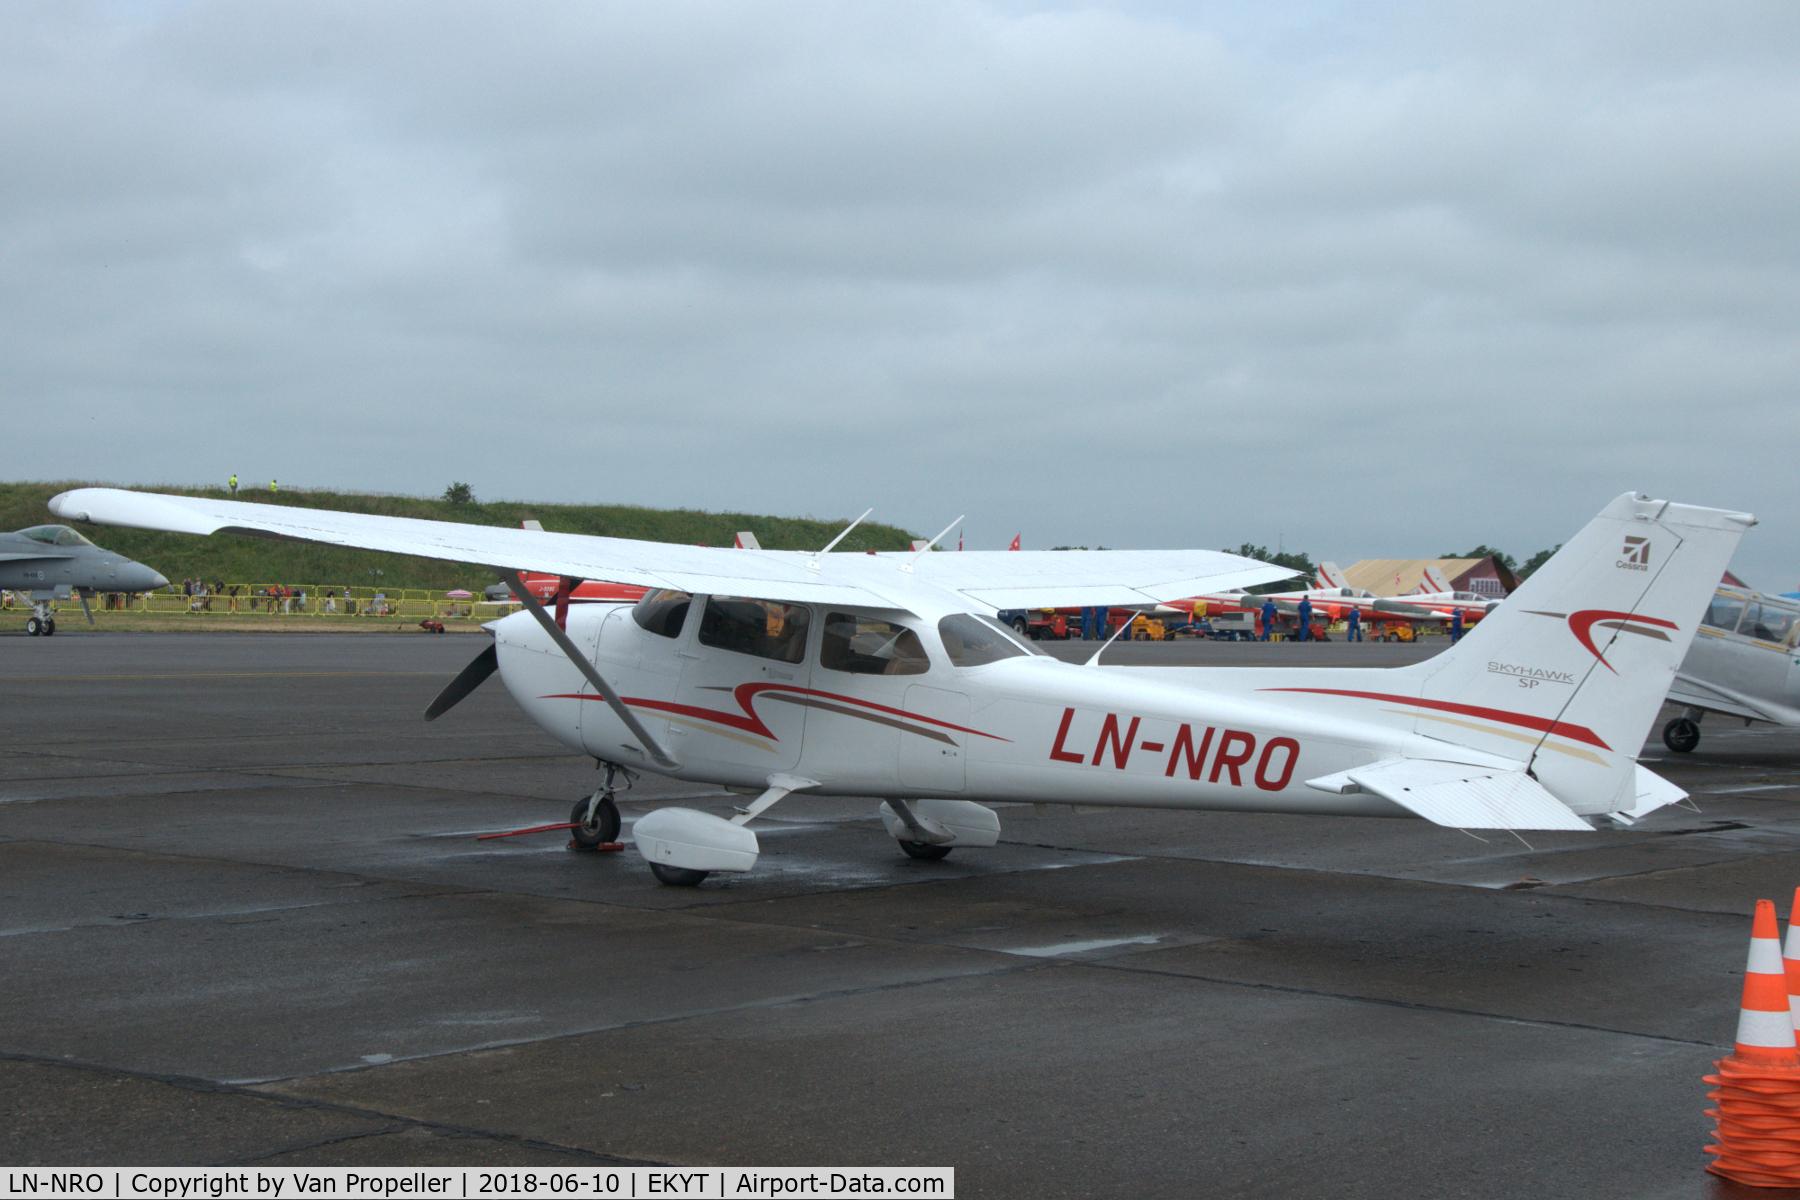 LN-NRO, Cessna 172S Skyhawk C/N 172S11011, Cessna 172S Skyhawk SP of the Norwegian Nedre Romerike Flyklubb at Aalborg airport, Denmark (air show 2018)